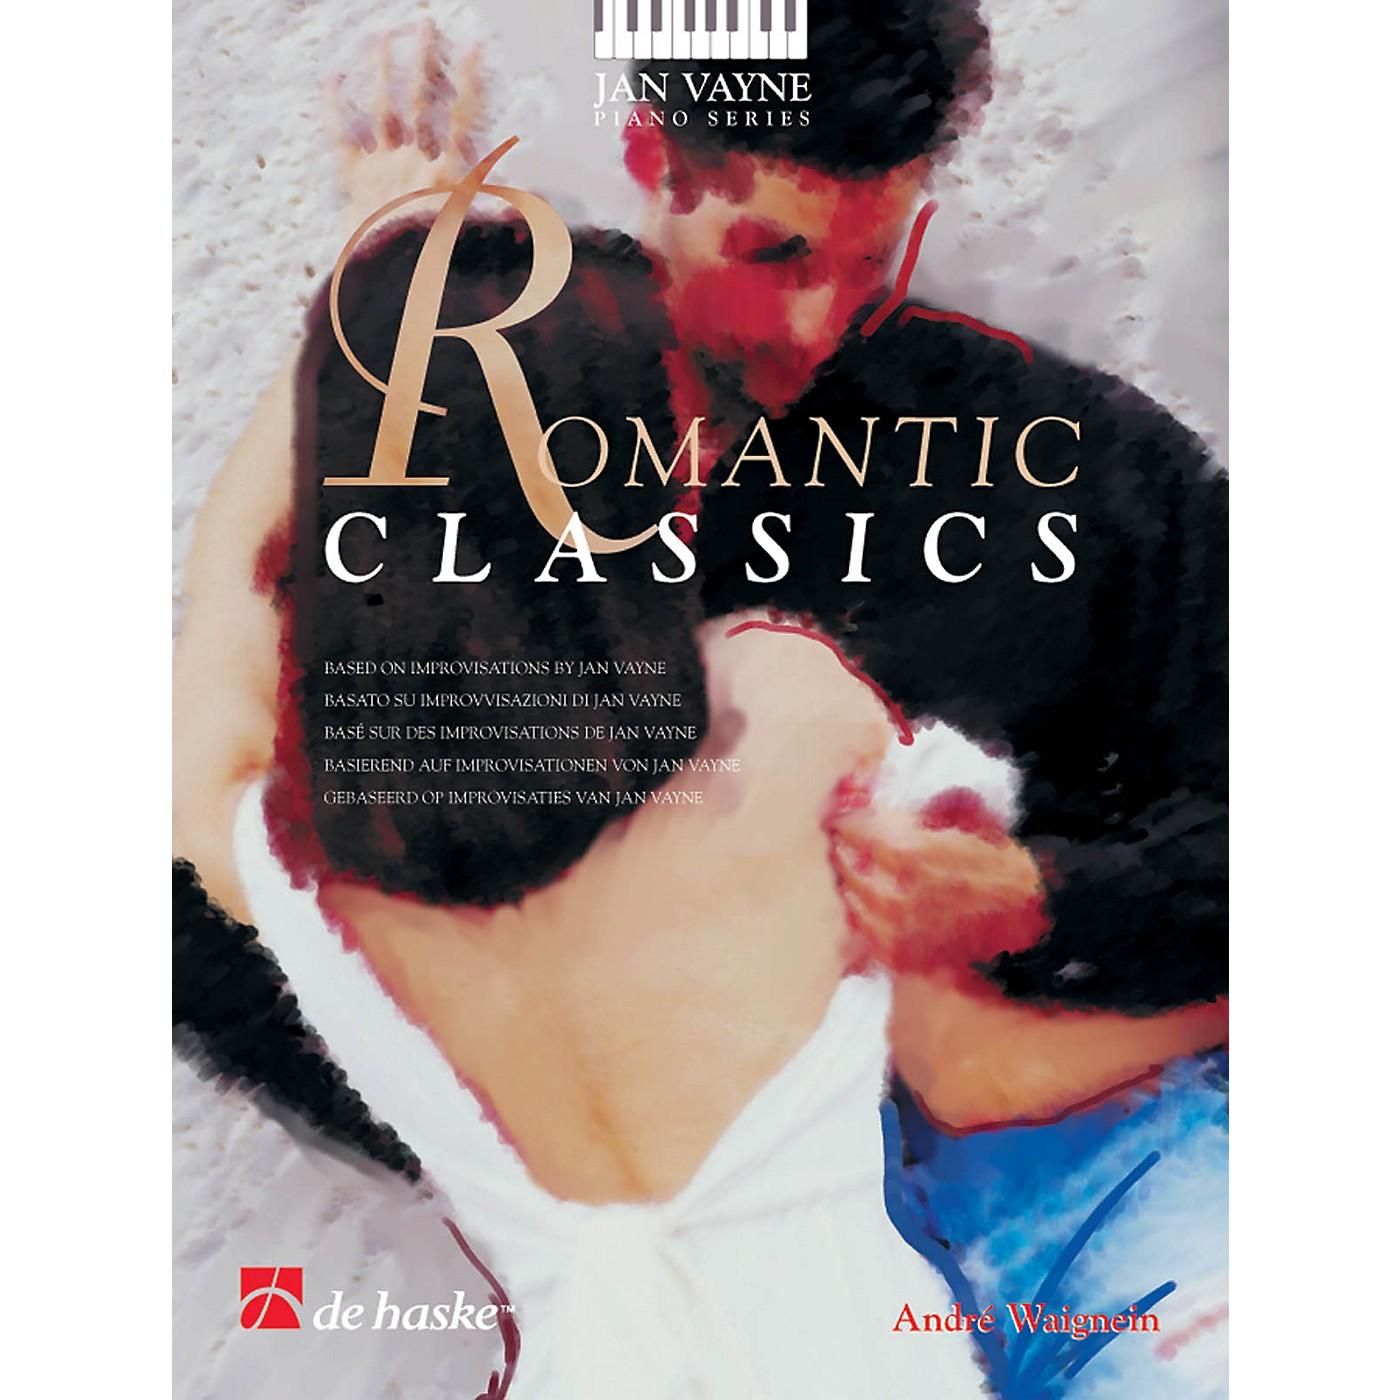 Hal Leonard Romantic Classics Jan Vayne Piano Series Concert Band thumbnail